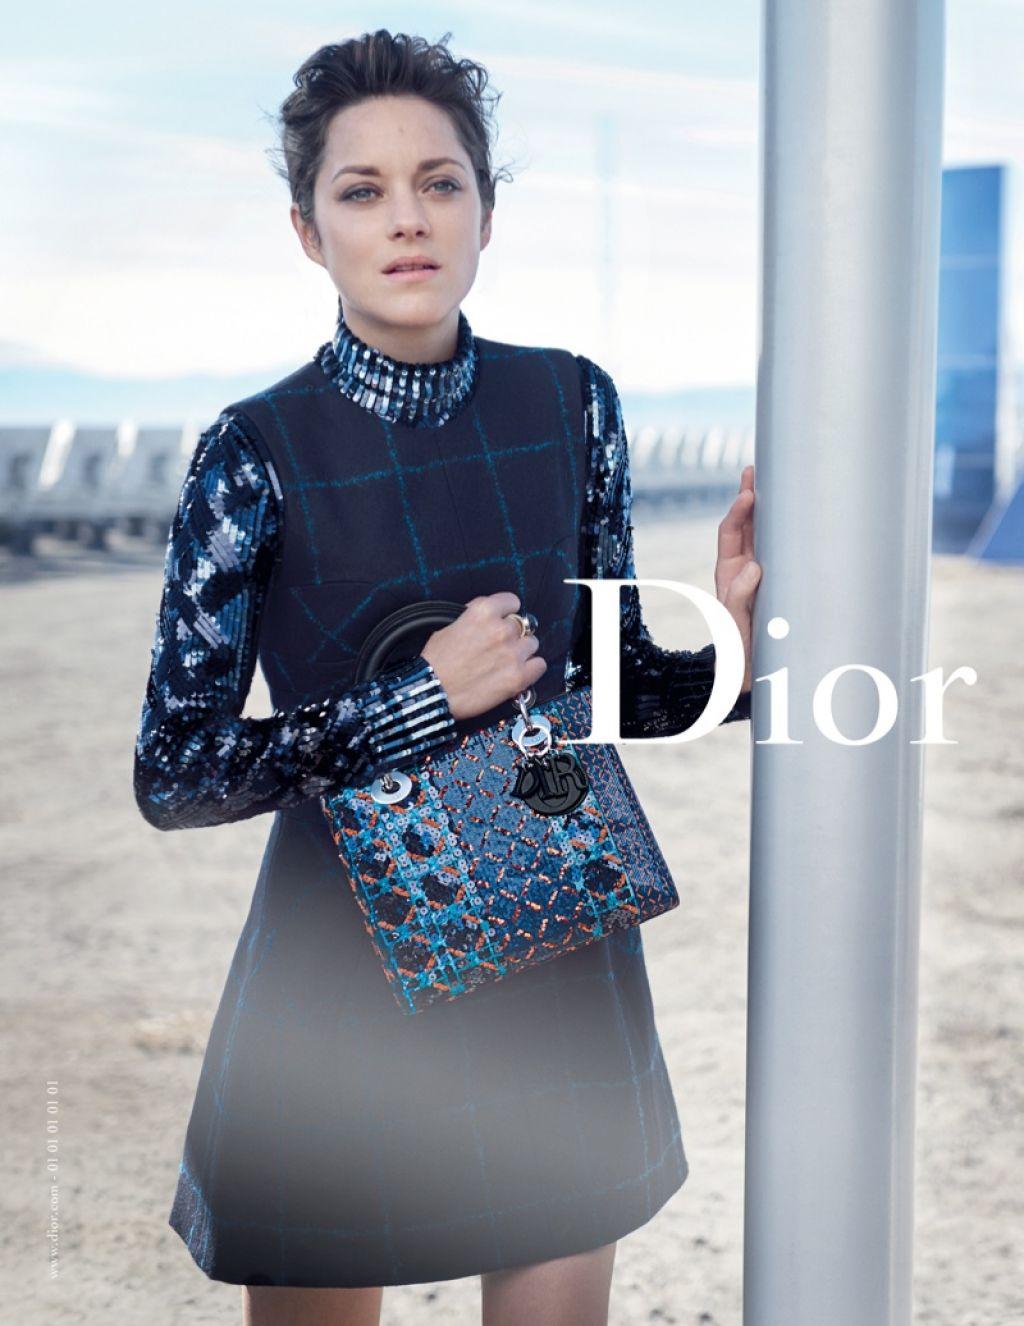 Marion Cotillard – Lady Dior 2015 Marion Cotillard